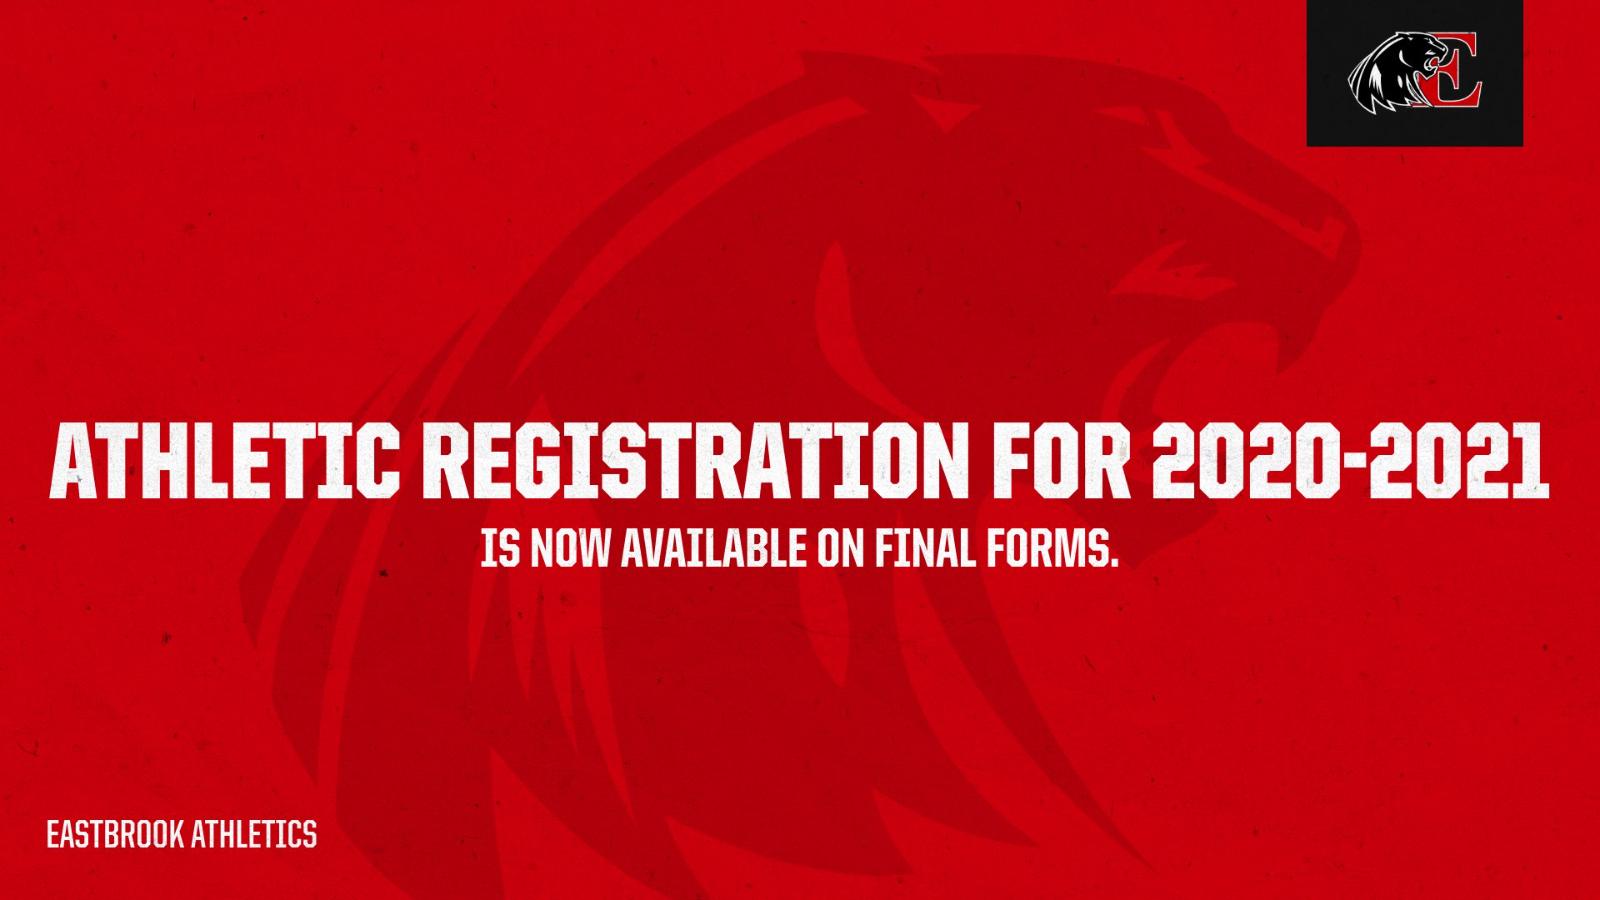 2020-2021 Athletic Registrations